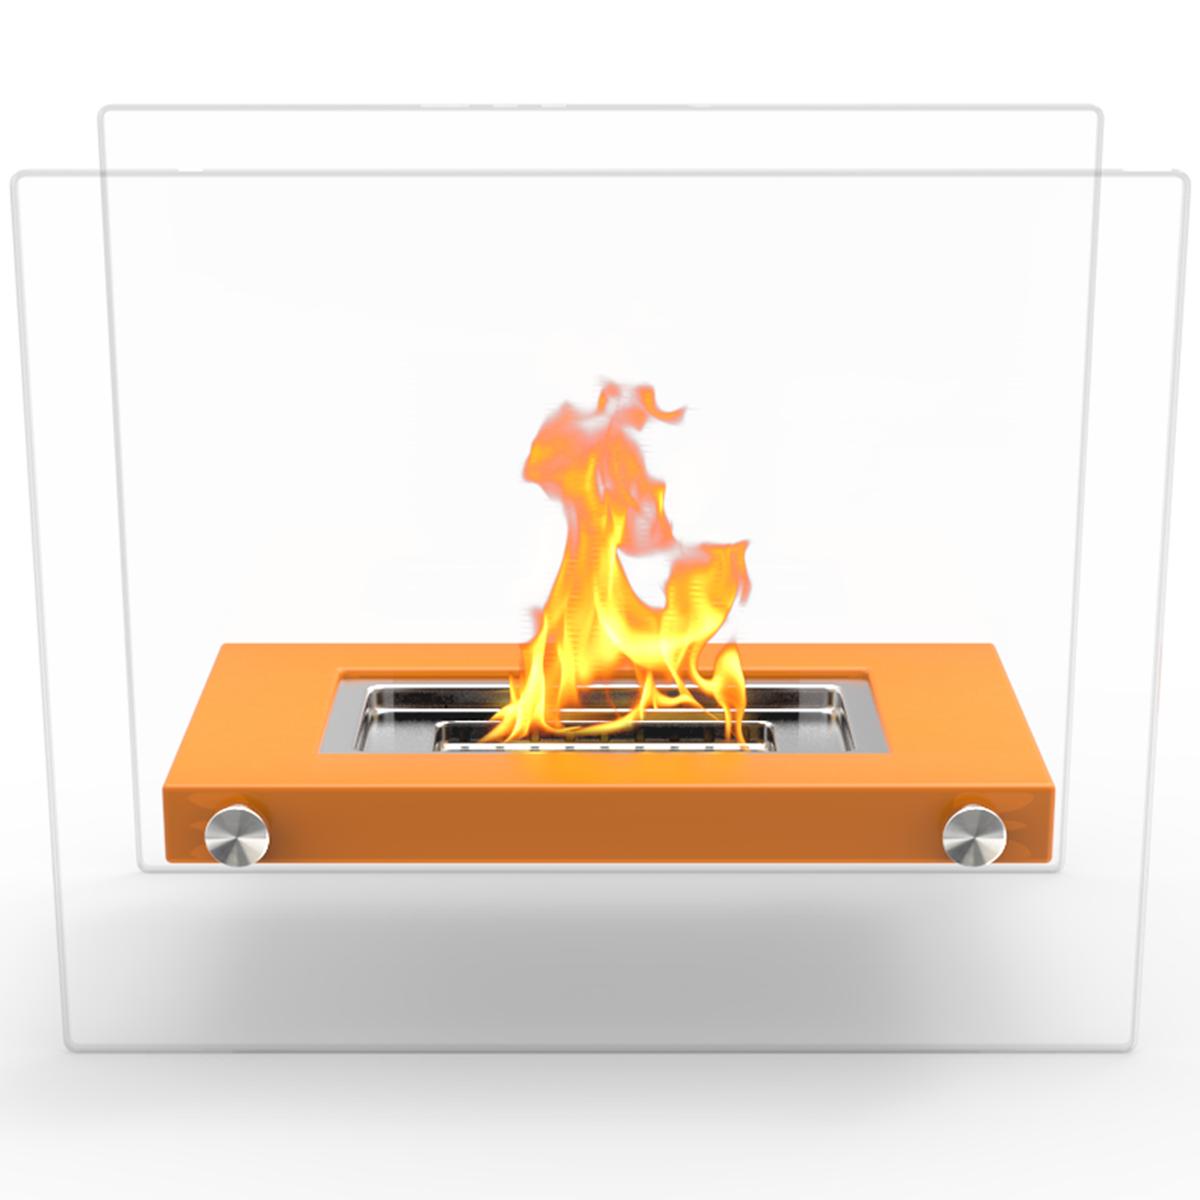 Regal Flame Monrow Ventless Tabletop Portable Bio Ethanol